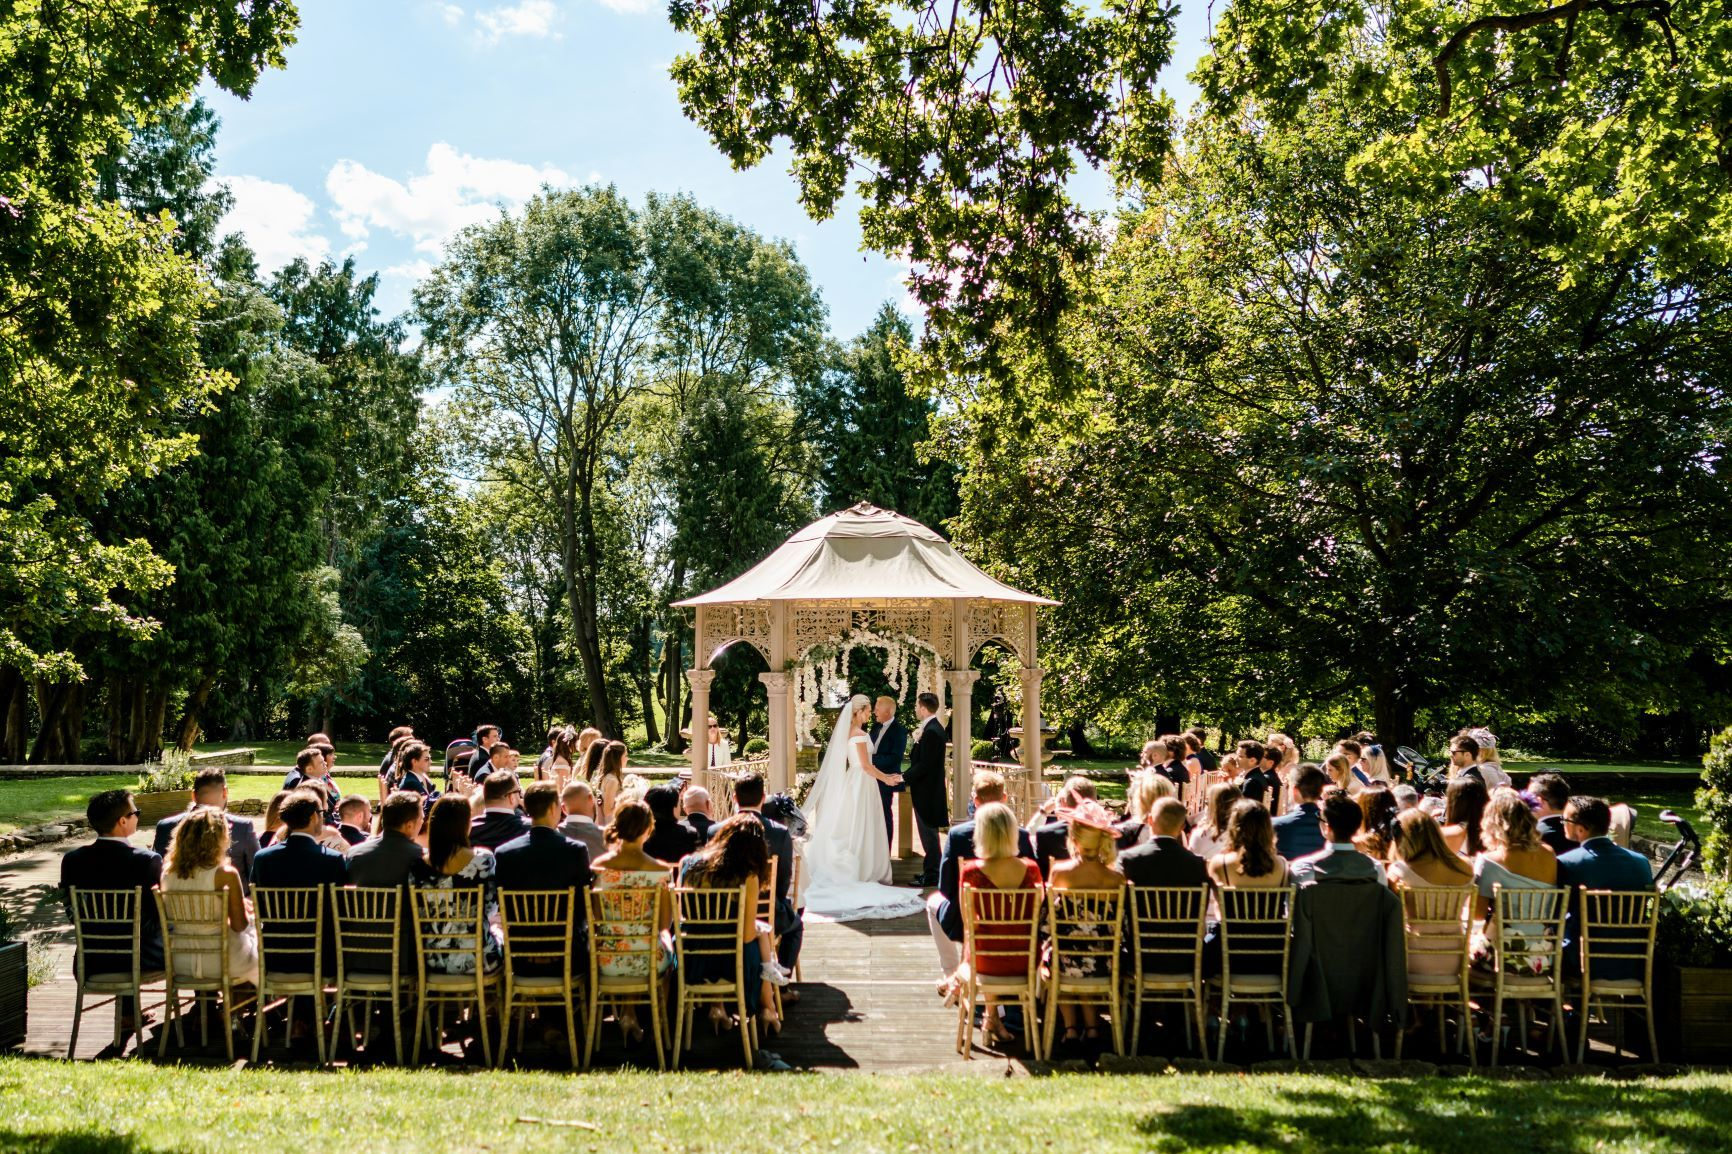 Wedding Venue Eastington Park Gloucestershire Eastington Weddingvenuedirectory Com Wedding Venues Yorkshire Featured Wedding Wedding Venues